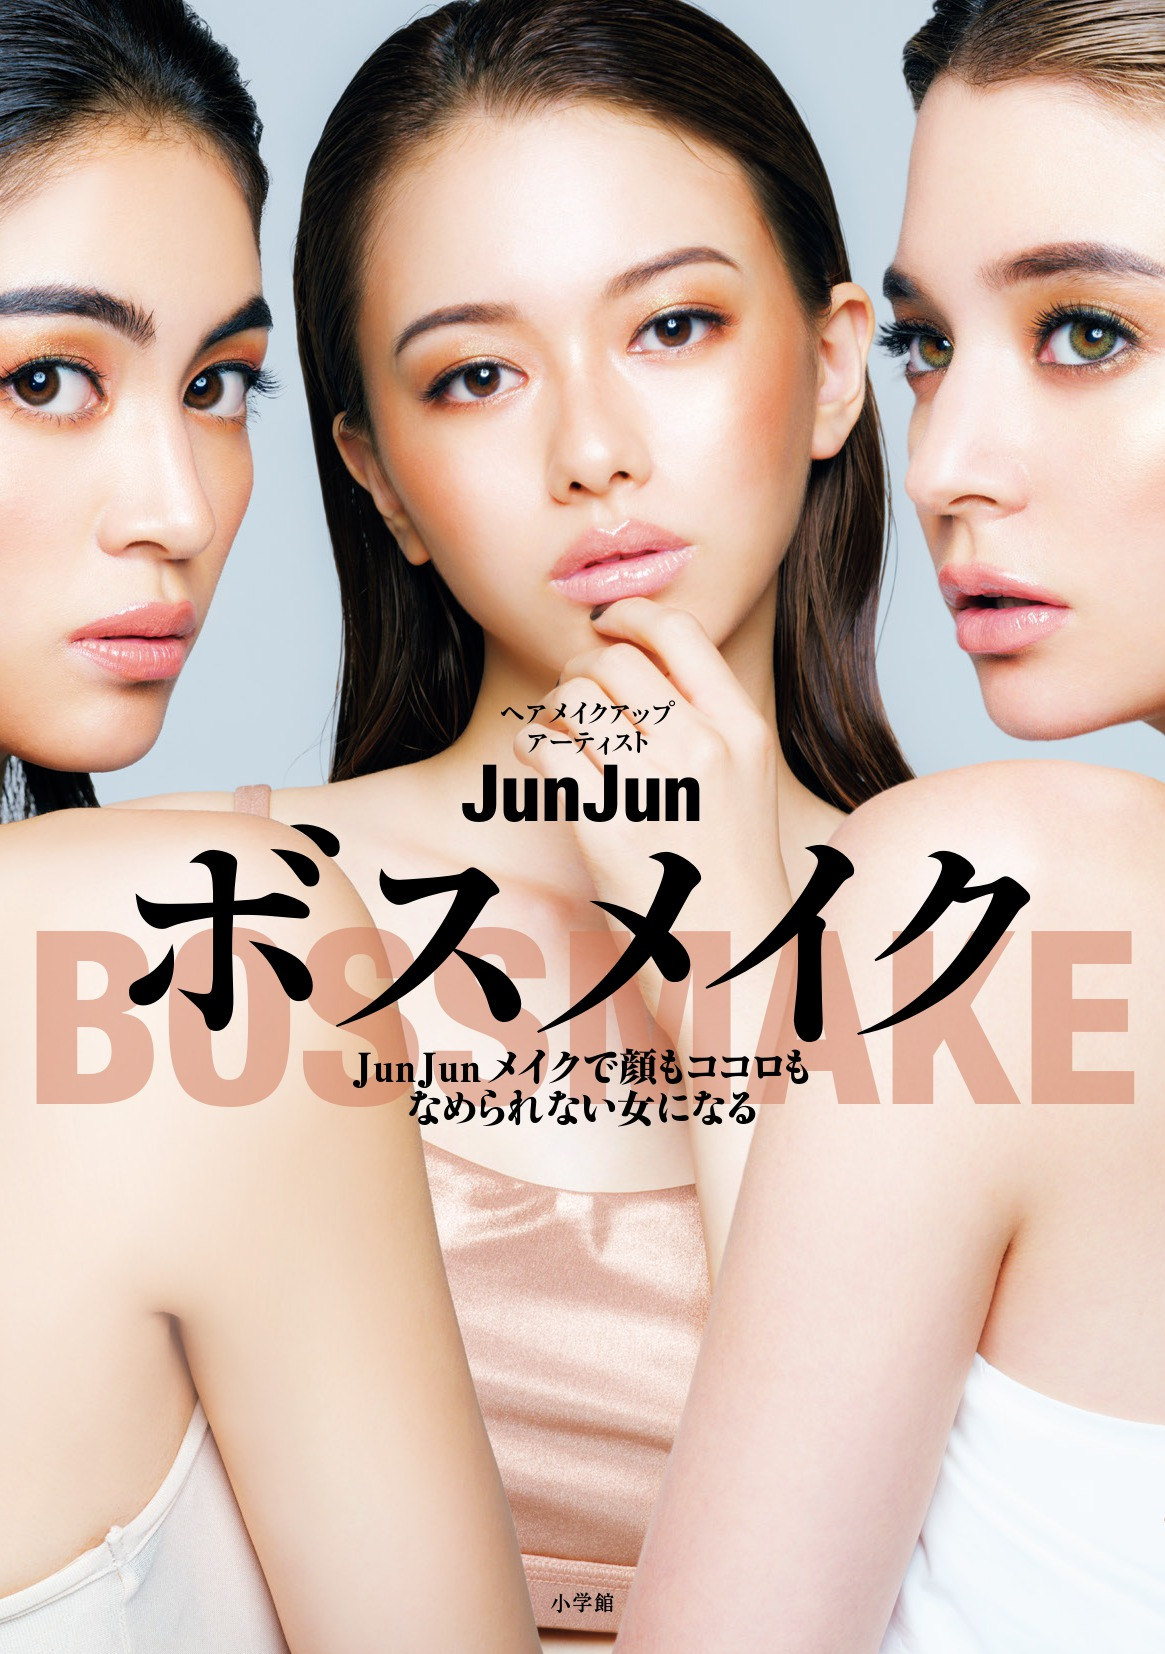 JunJun BOSSMAKE TOUR 2019